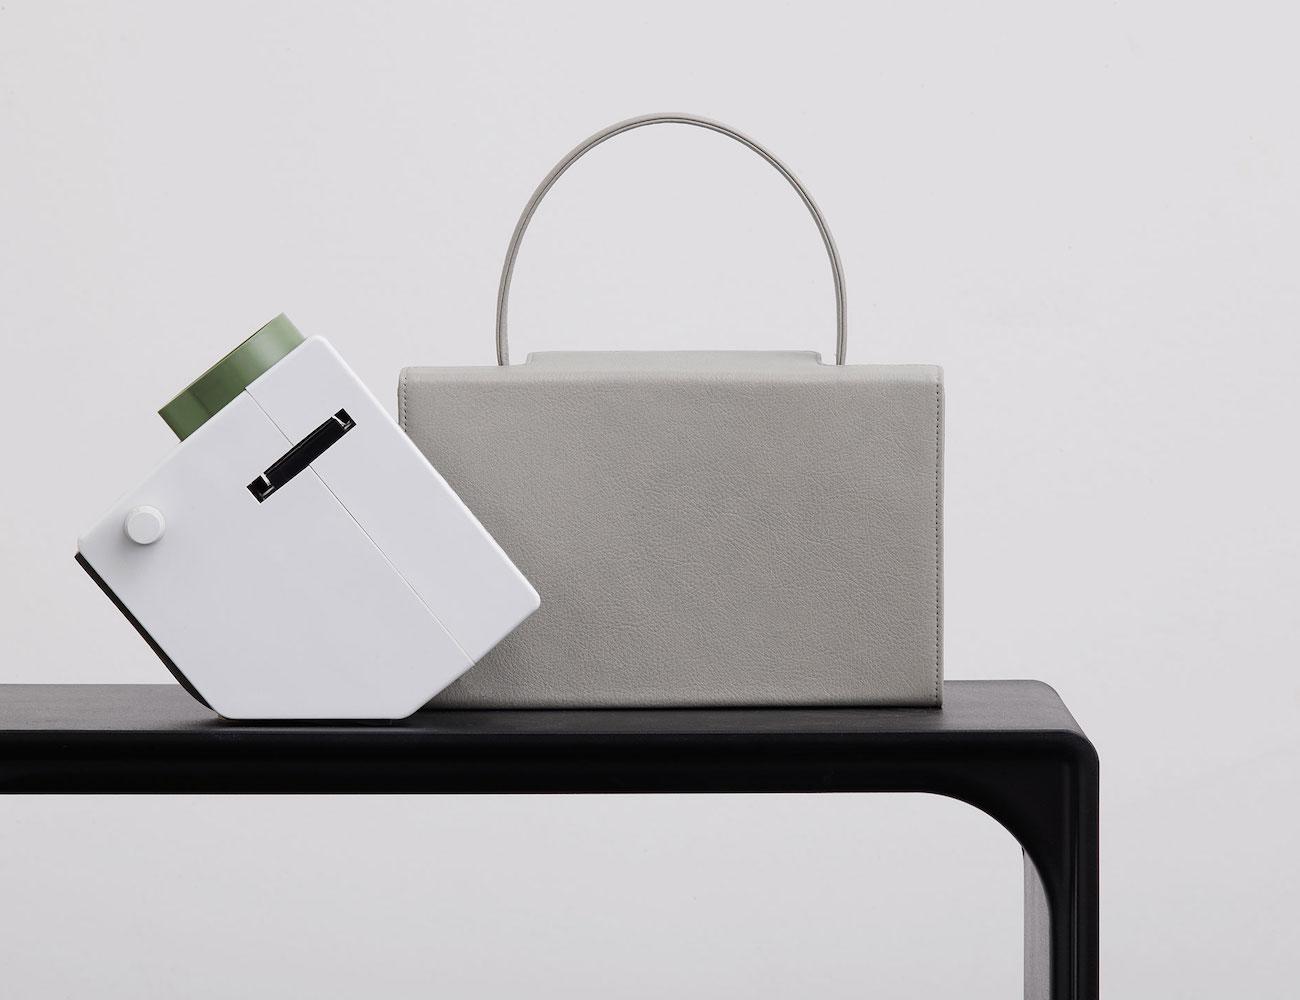 TSATSAS x Dieter Rams 931 Leather Handbag